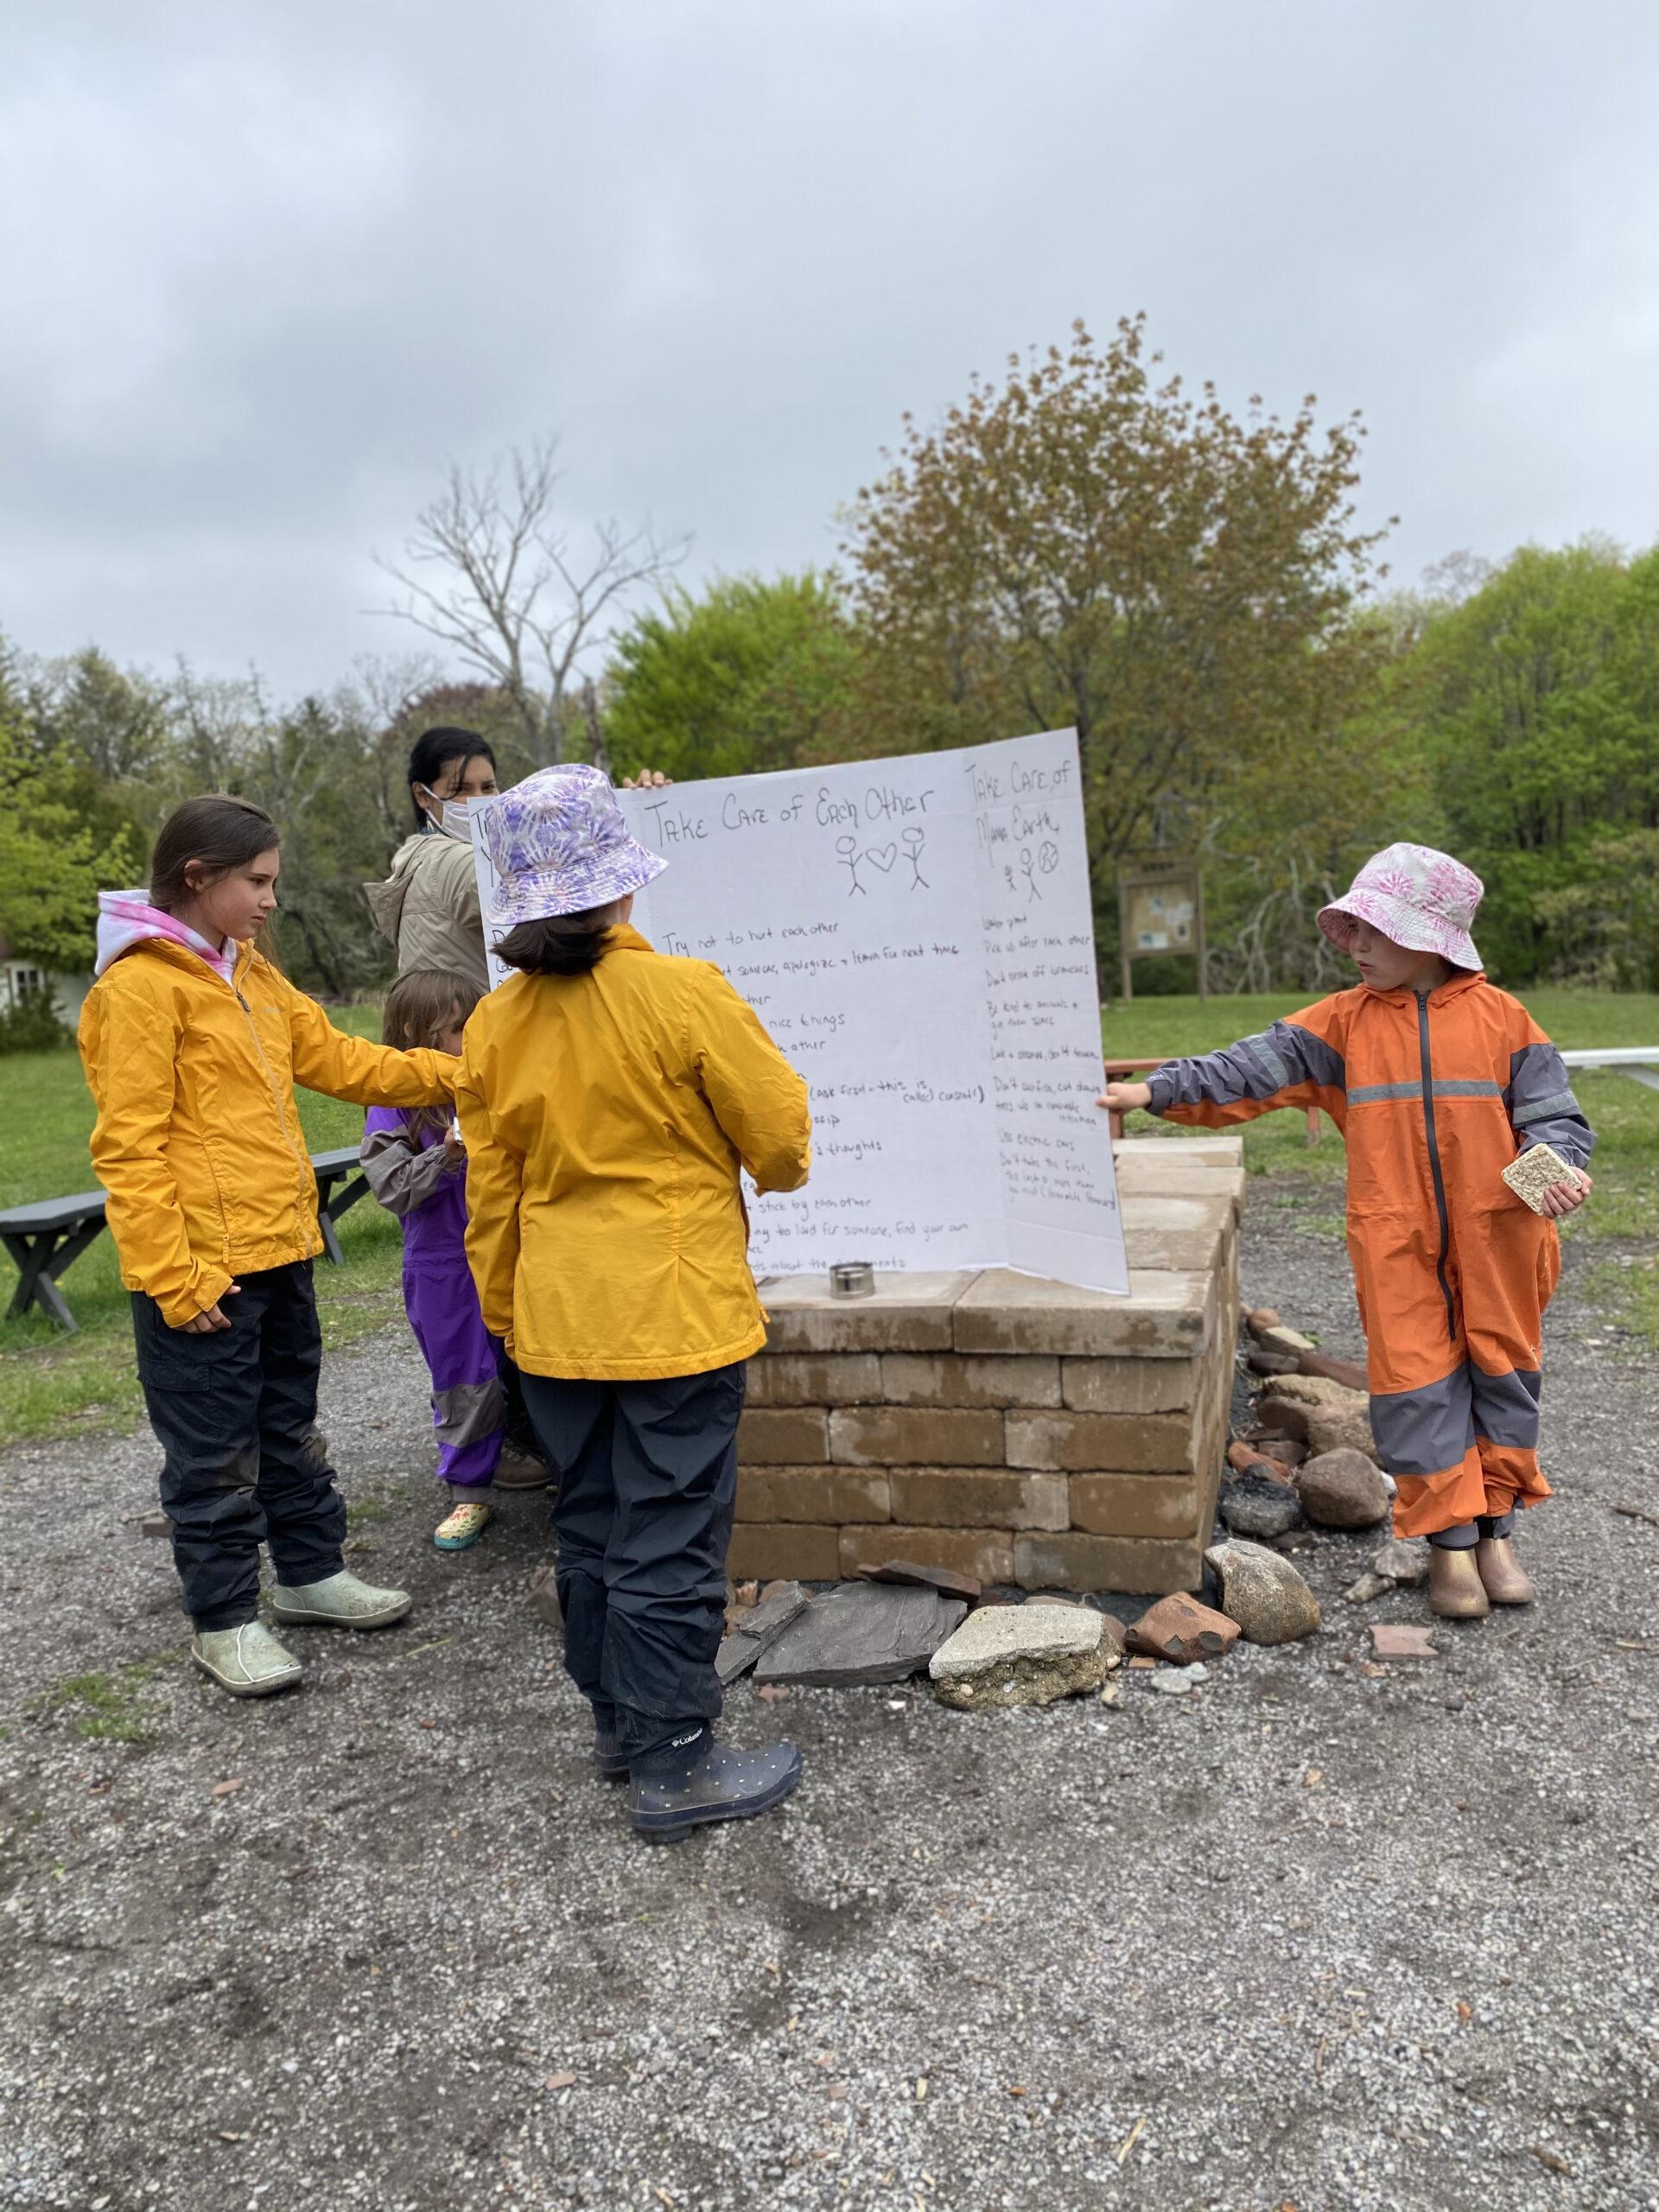 aishling forest school, child-led learning